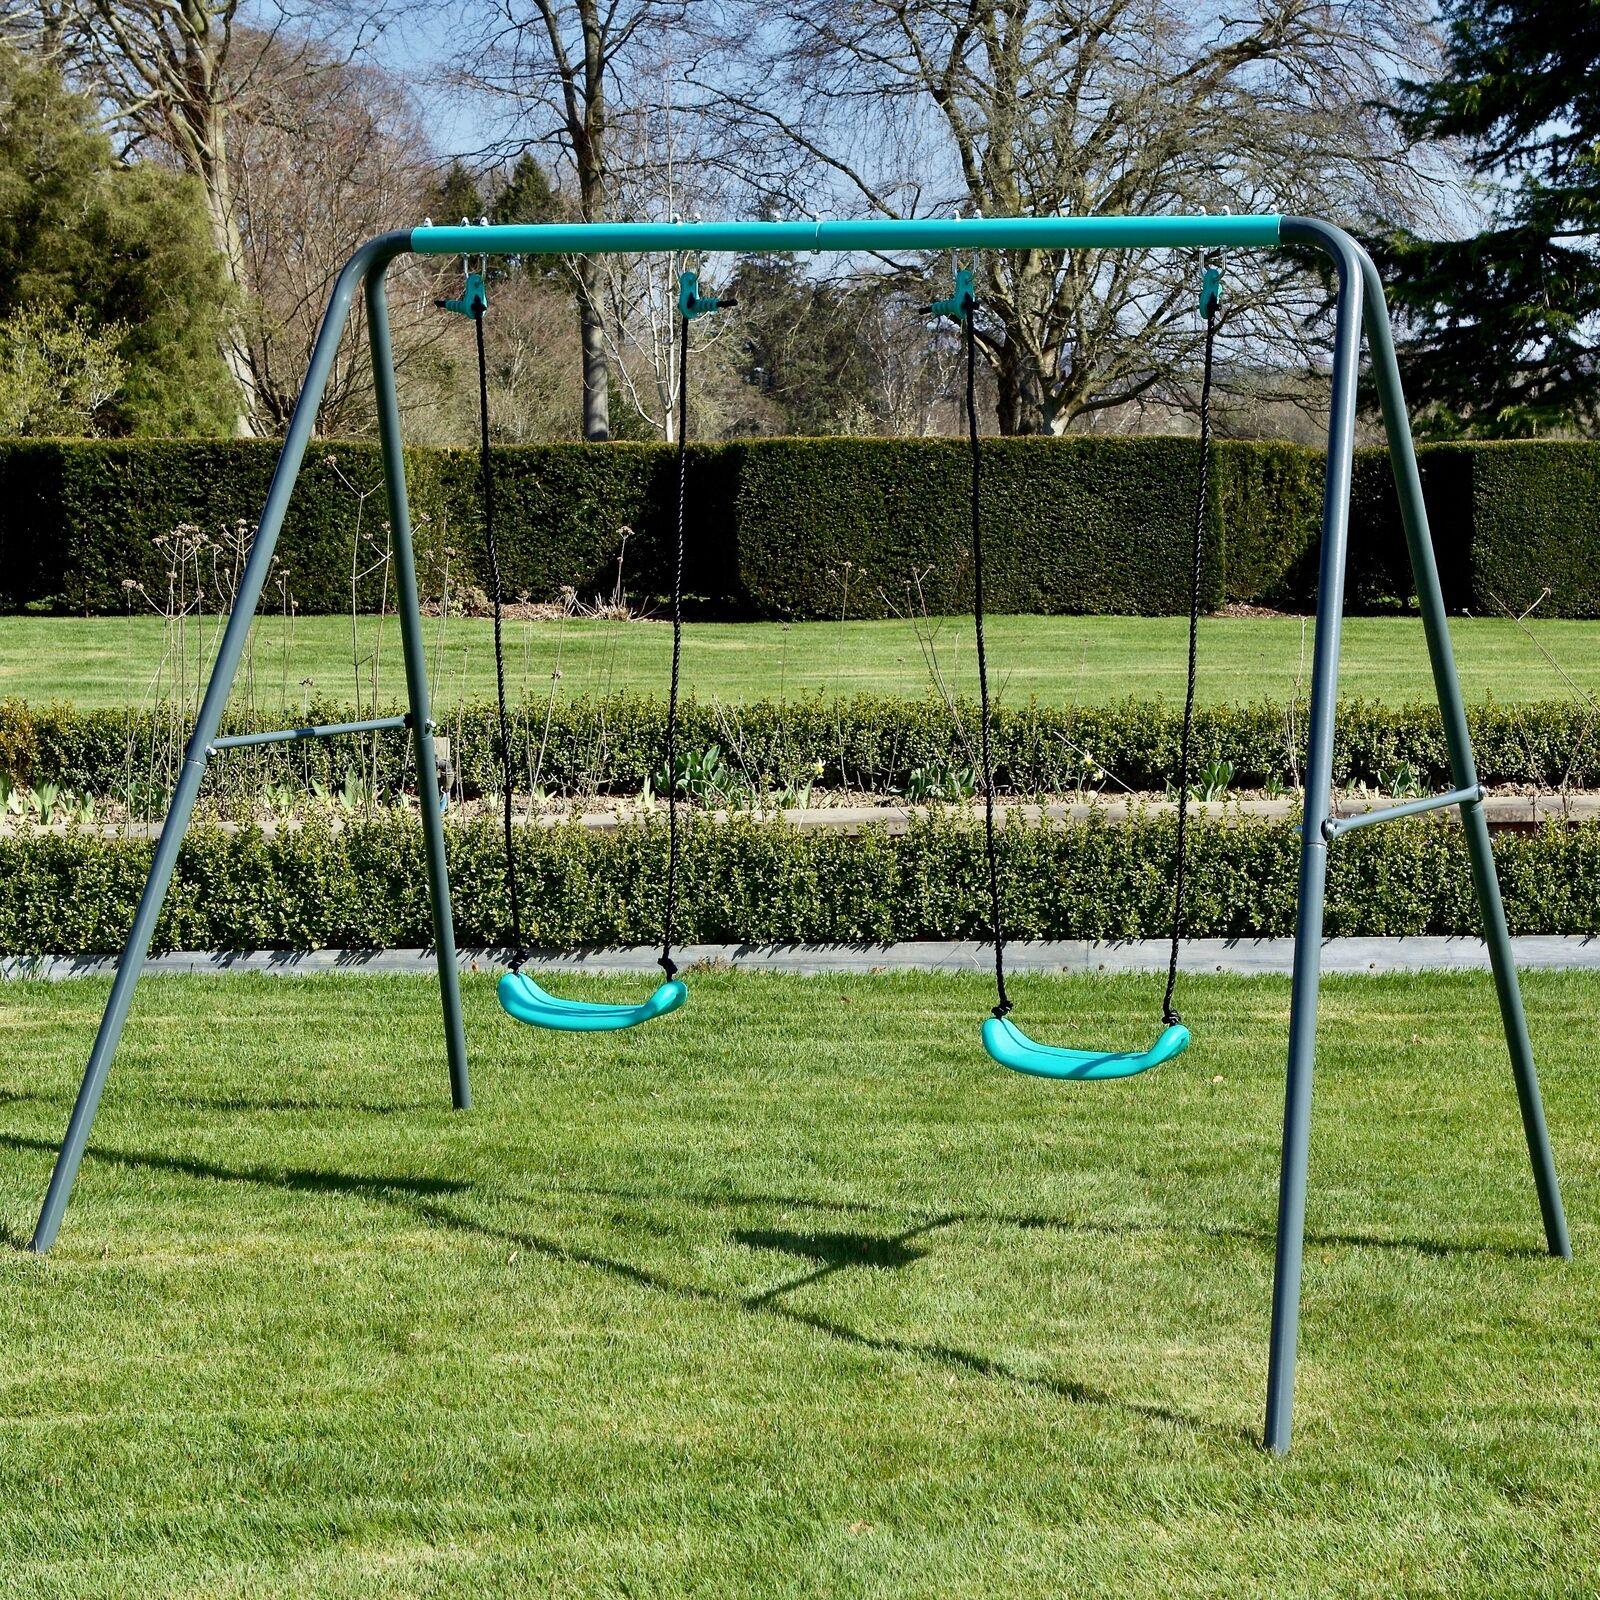 Rebo Children's Metal Garden Double Swing set for £84.96 delivered using code @ eBay / outdoortoy